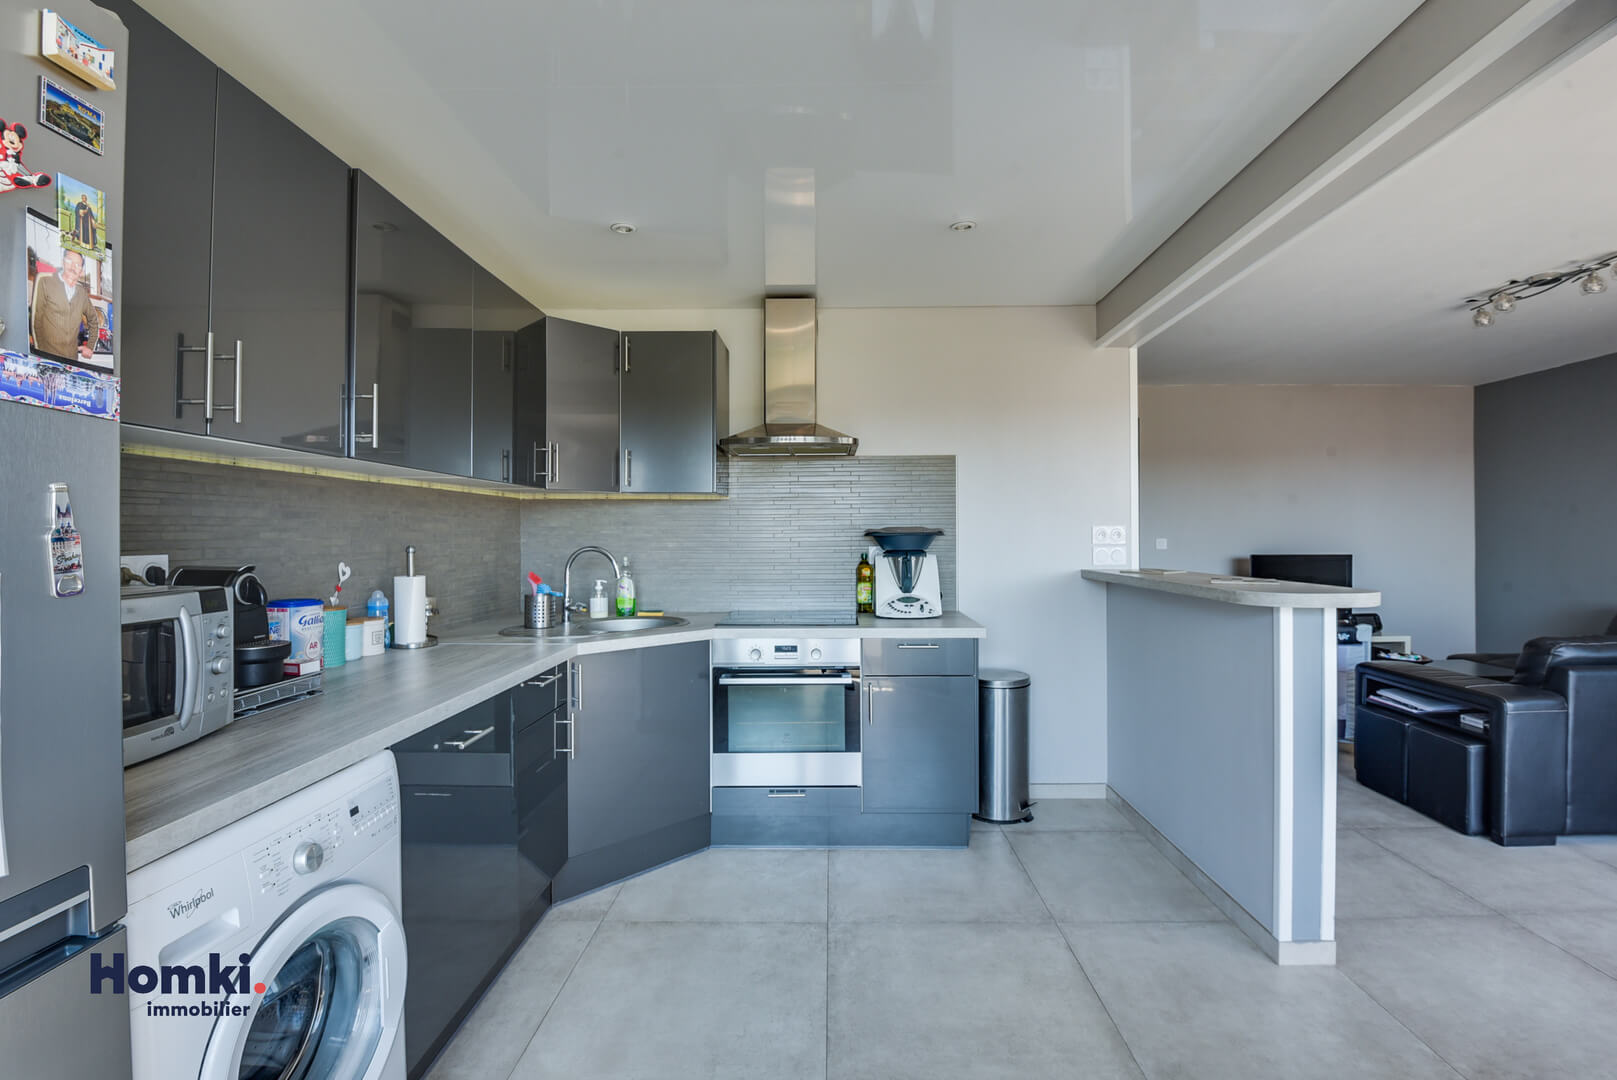 Vente Appartement 72 m² T3 13014 Marseille_5